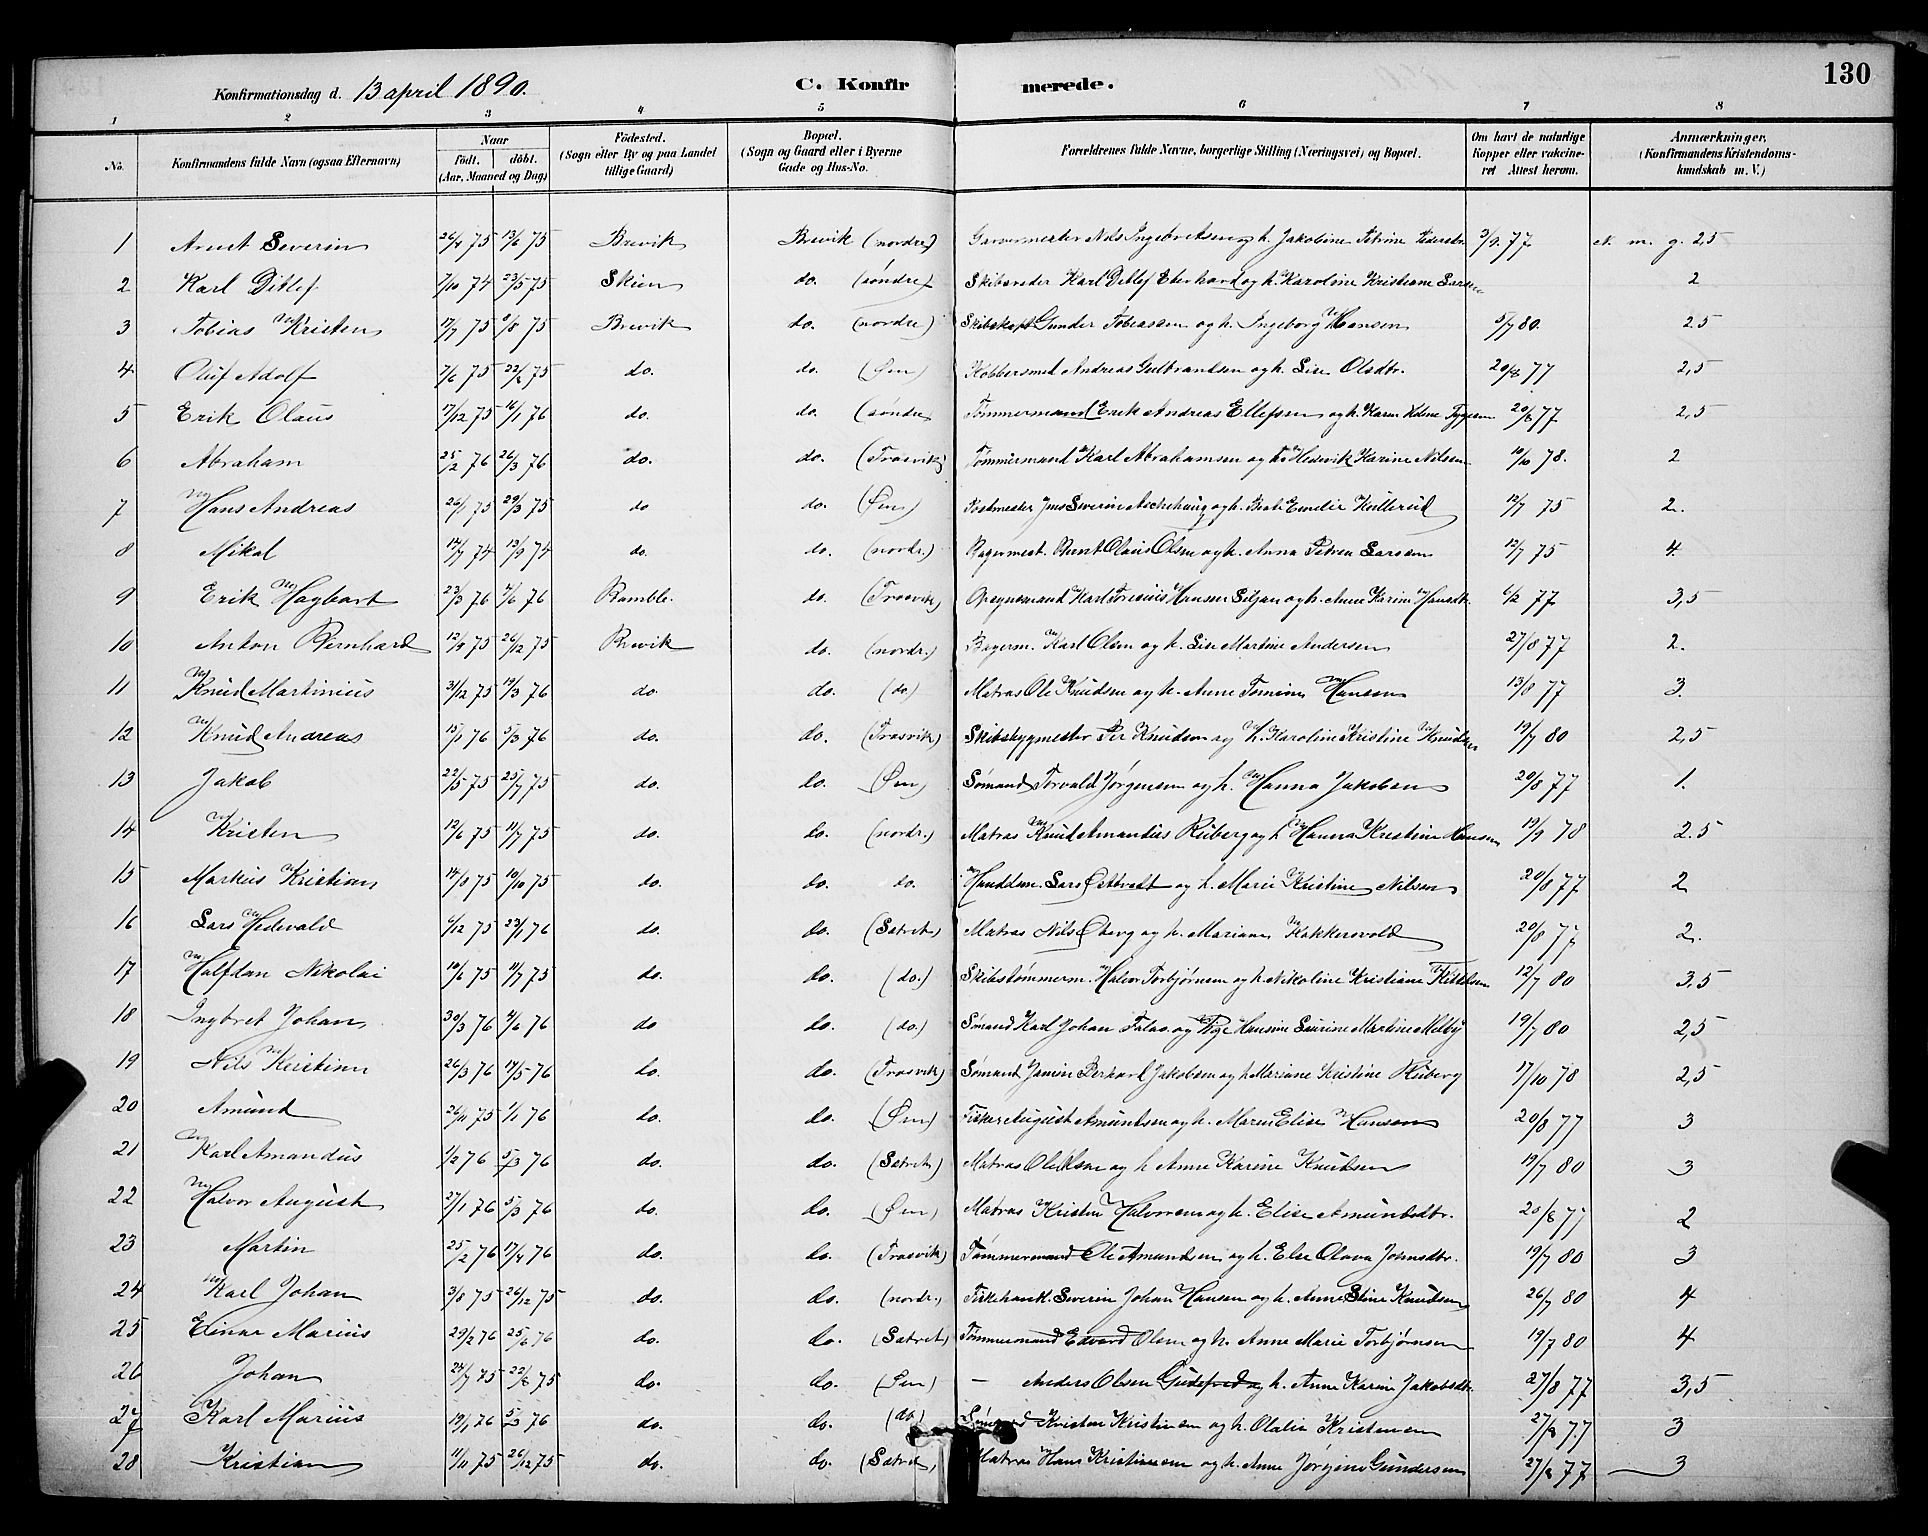 SAKO, Brevik kirkebøker, G/Ga/L0004: Klokkerbok nr. 4, 1882-1900, s. 130